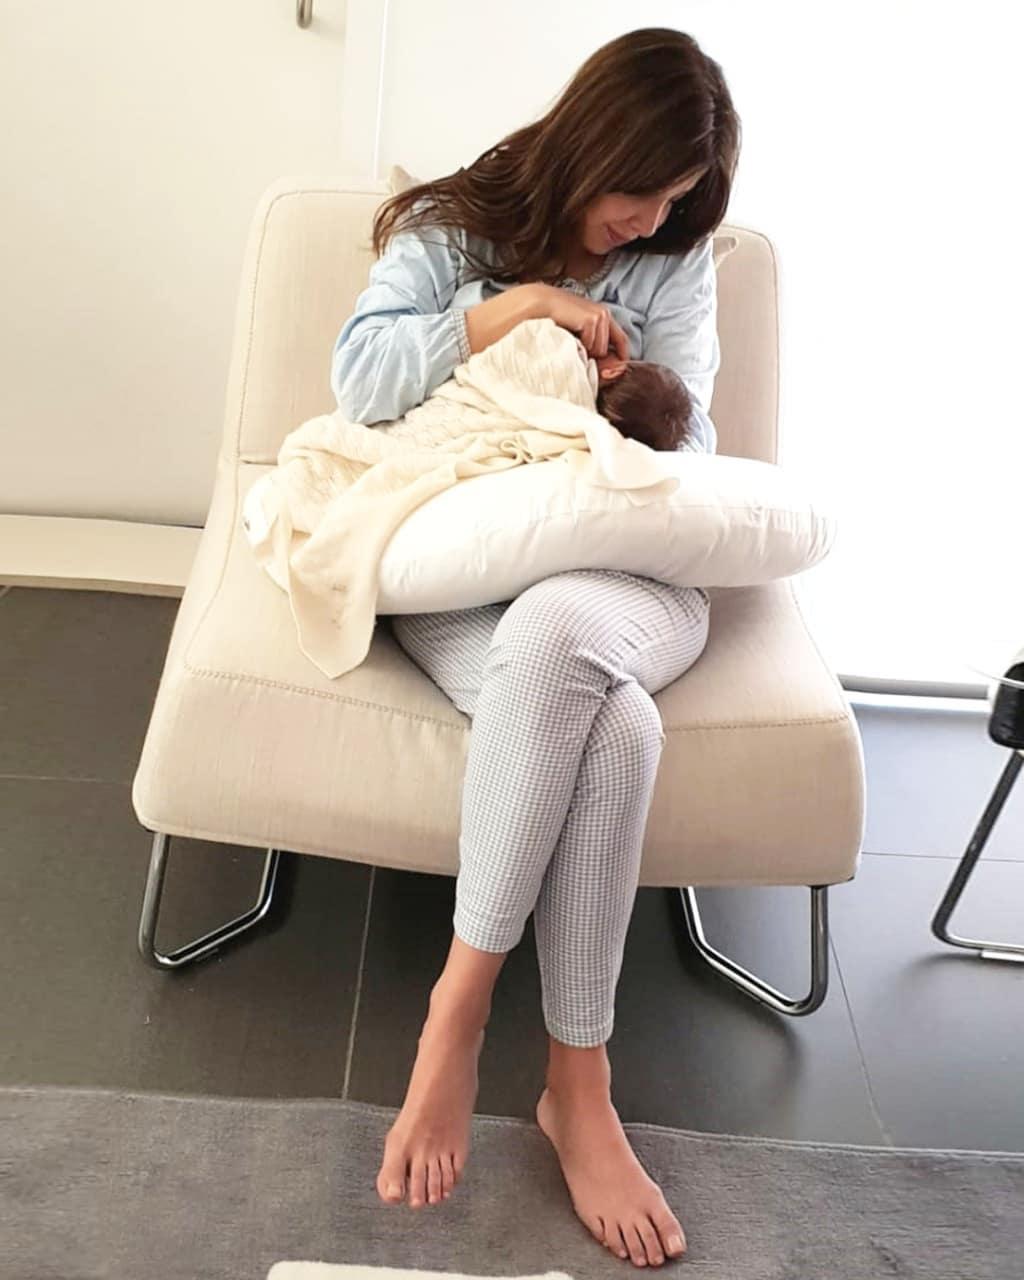 "0e7c09570f5f2 تداول جمهور النجمة اللبنانية نانسي عجرم على مواقع التواصل الاجتماعي بعض  الصور لـ الزينة التي جهزتها صاحبة ""الحب زي الوتر"" لاستقبال مولودتها الجديدة  ""ليا""."